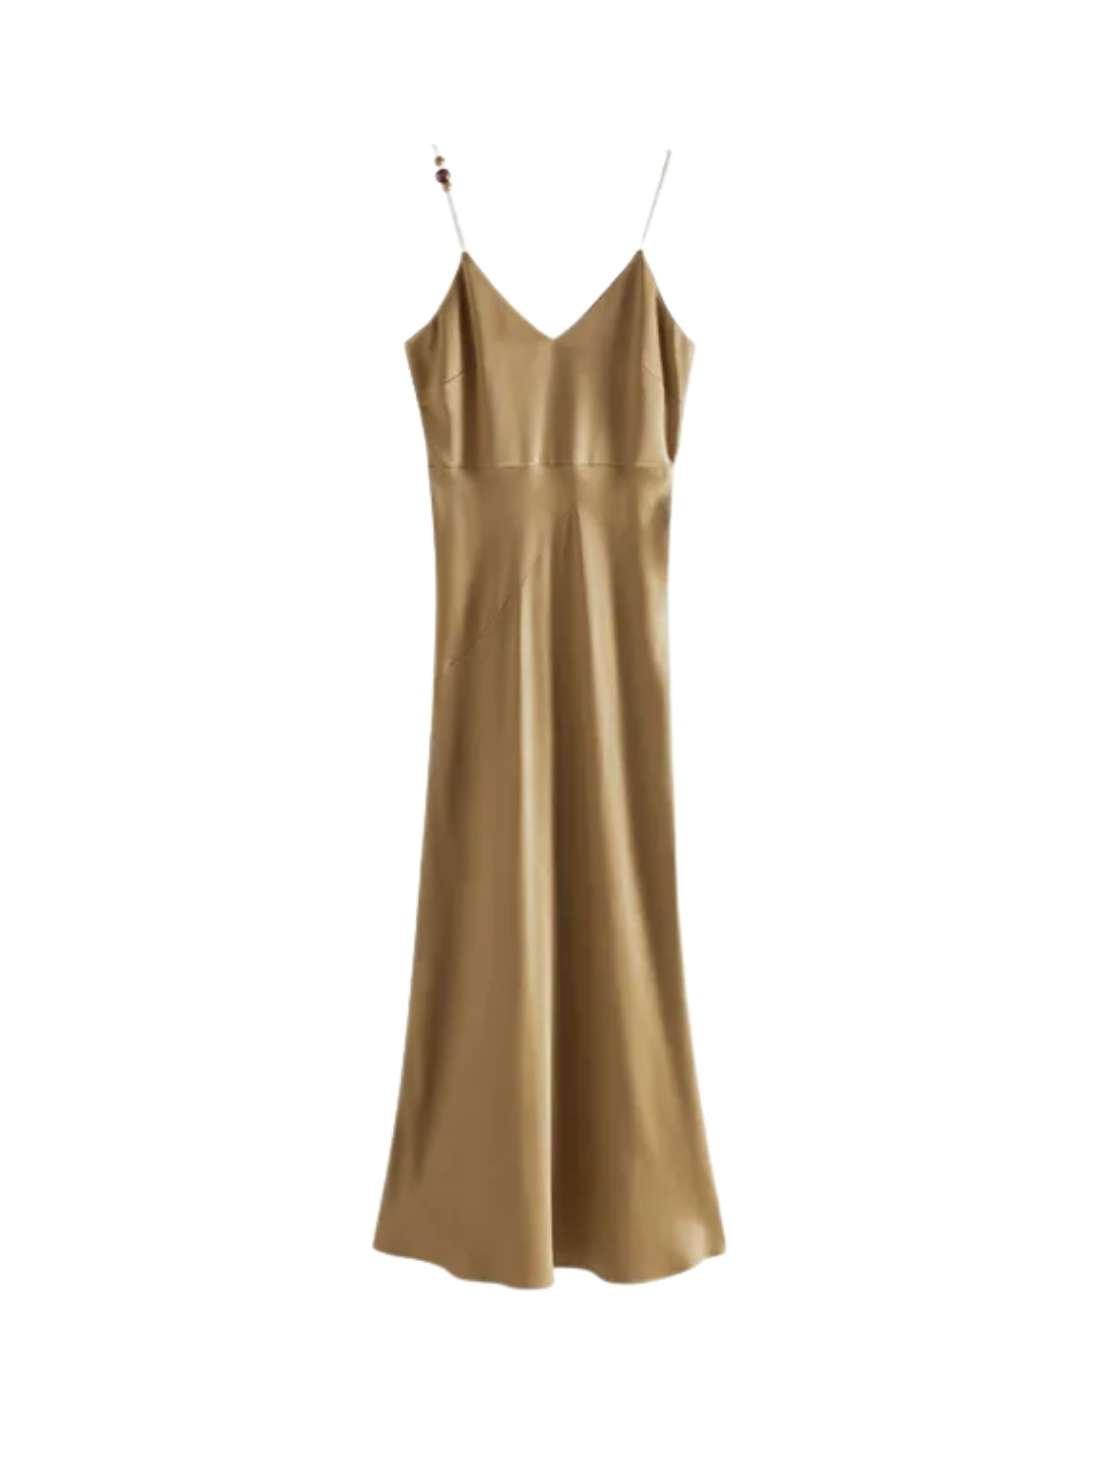 Fashion High-Quality Slip Dresses Silk Satin